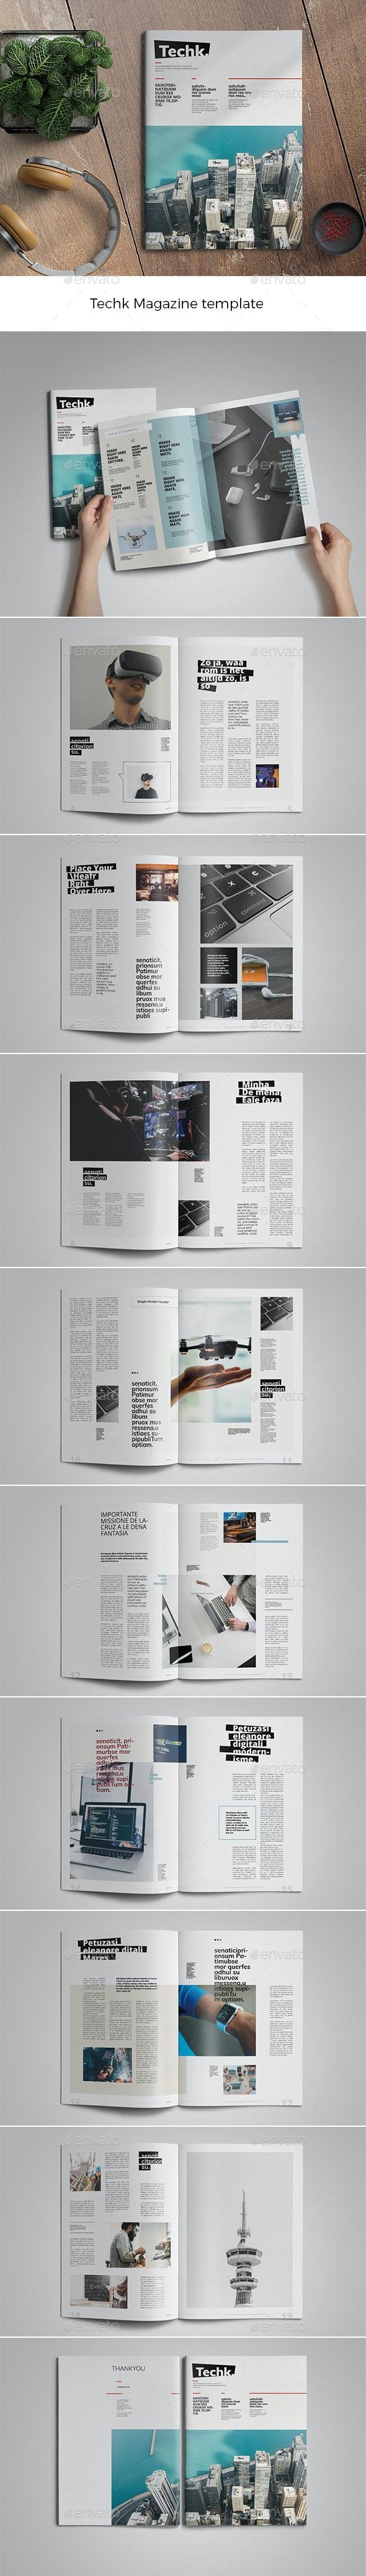 Techk Magazine Template - Magazines Print Templates